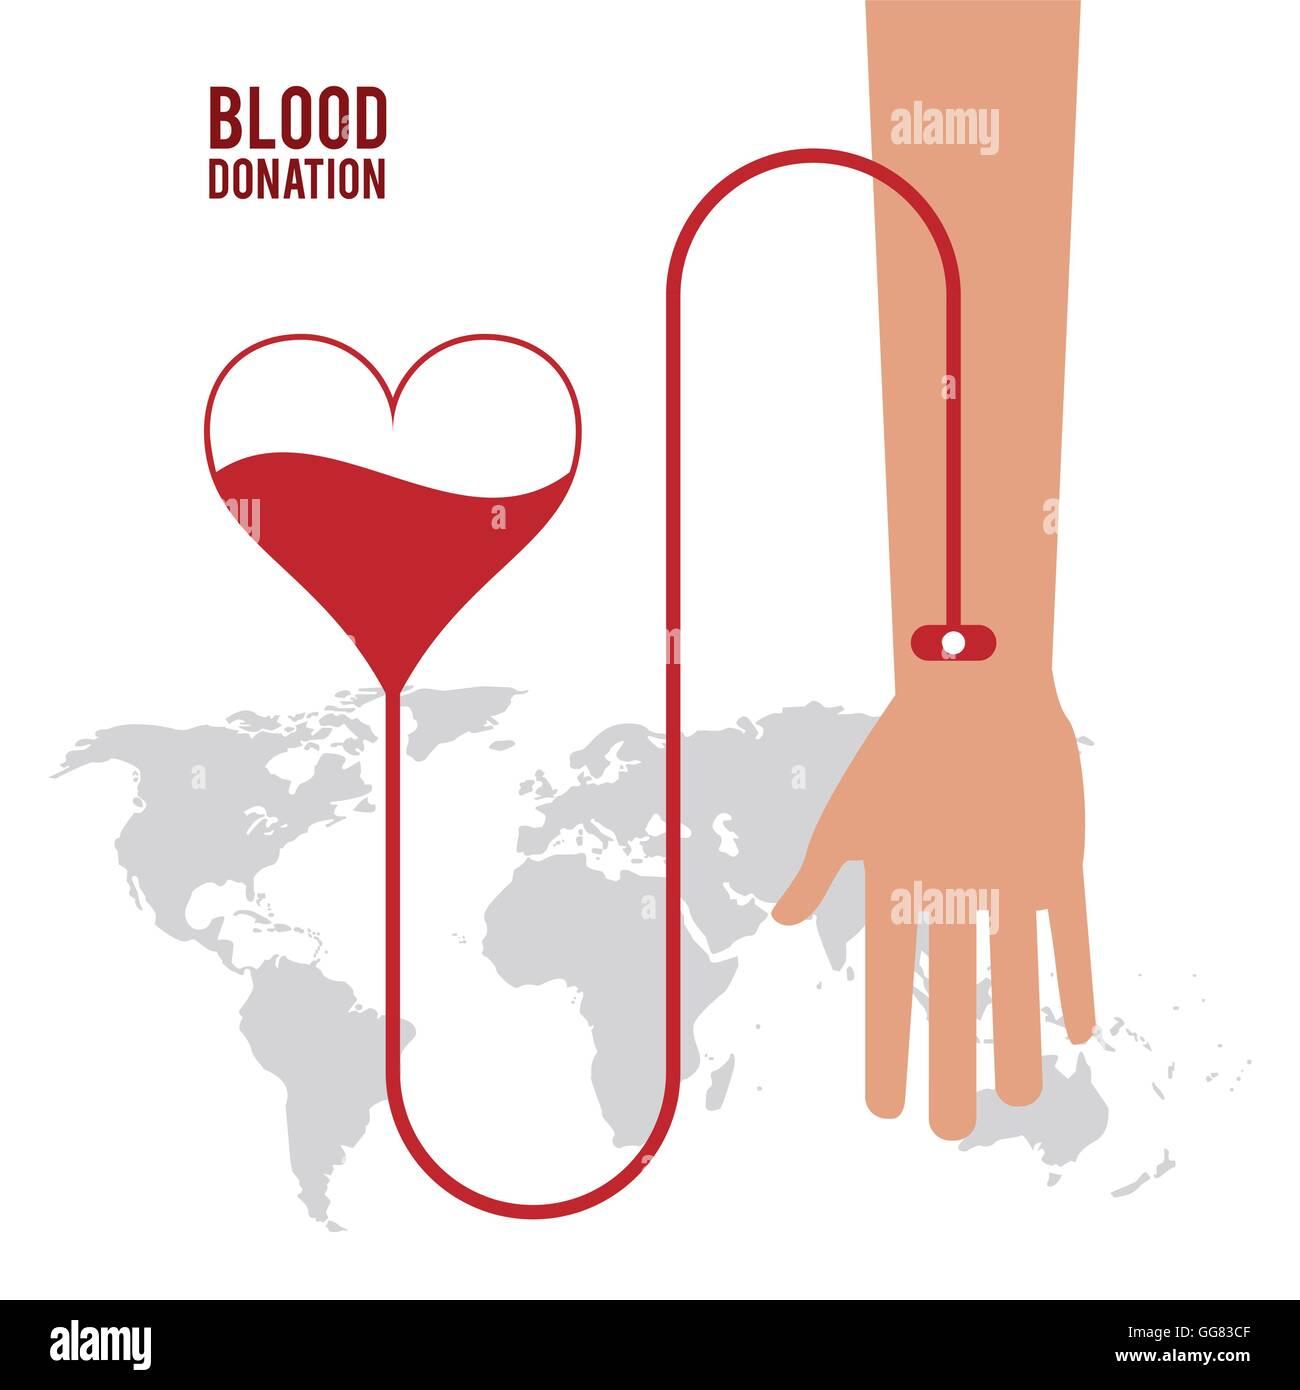 Heart arm blood donation icon vector graphic stock vector art heart arm blood donation icon vector graphic buycottarizona